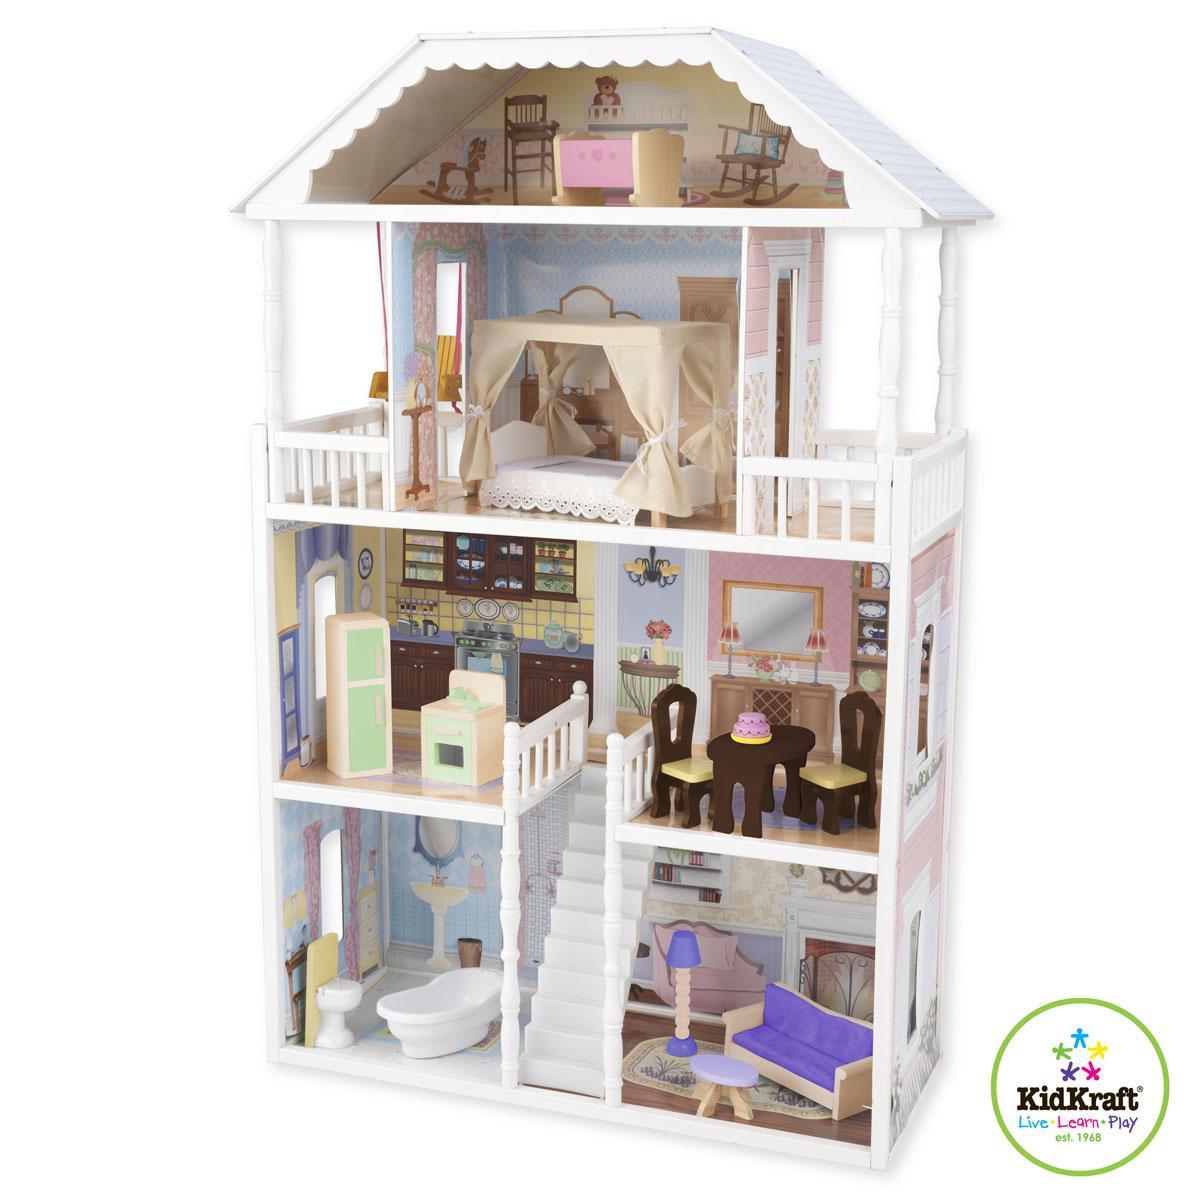 kidkraft puppenhaus savannah 65023 aus holz. Black Bedroom Furniture Sets. Home Design Ideas